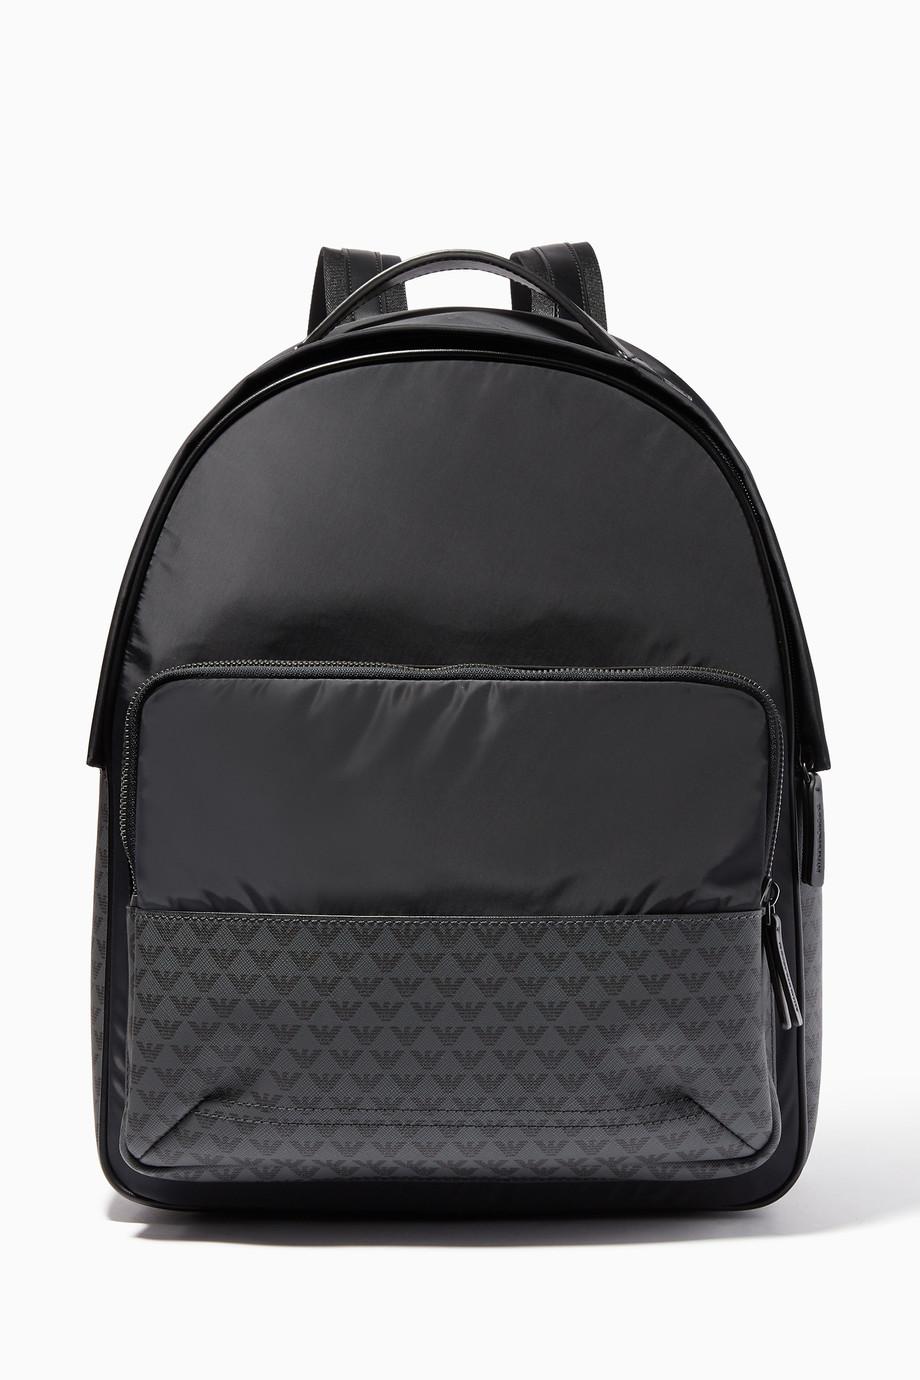 9da581e9285e1 تسوق حقيبة ظهر بشعار الماركة كحلي امبوريو ارماني أزرق للرجال